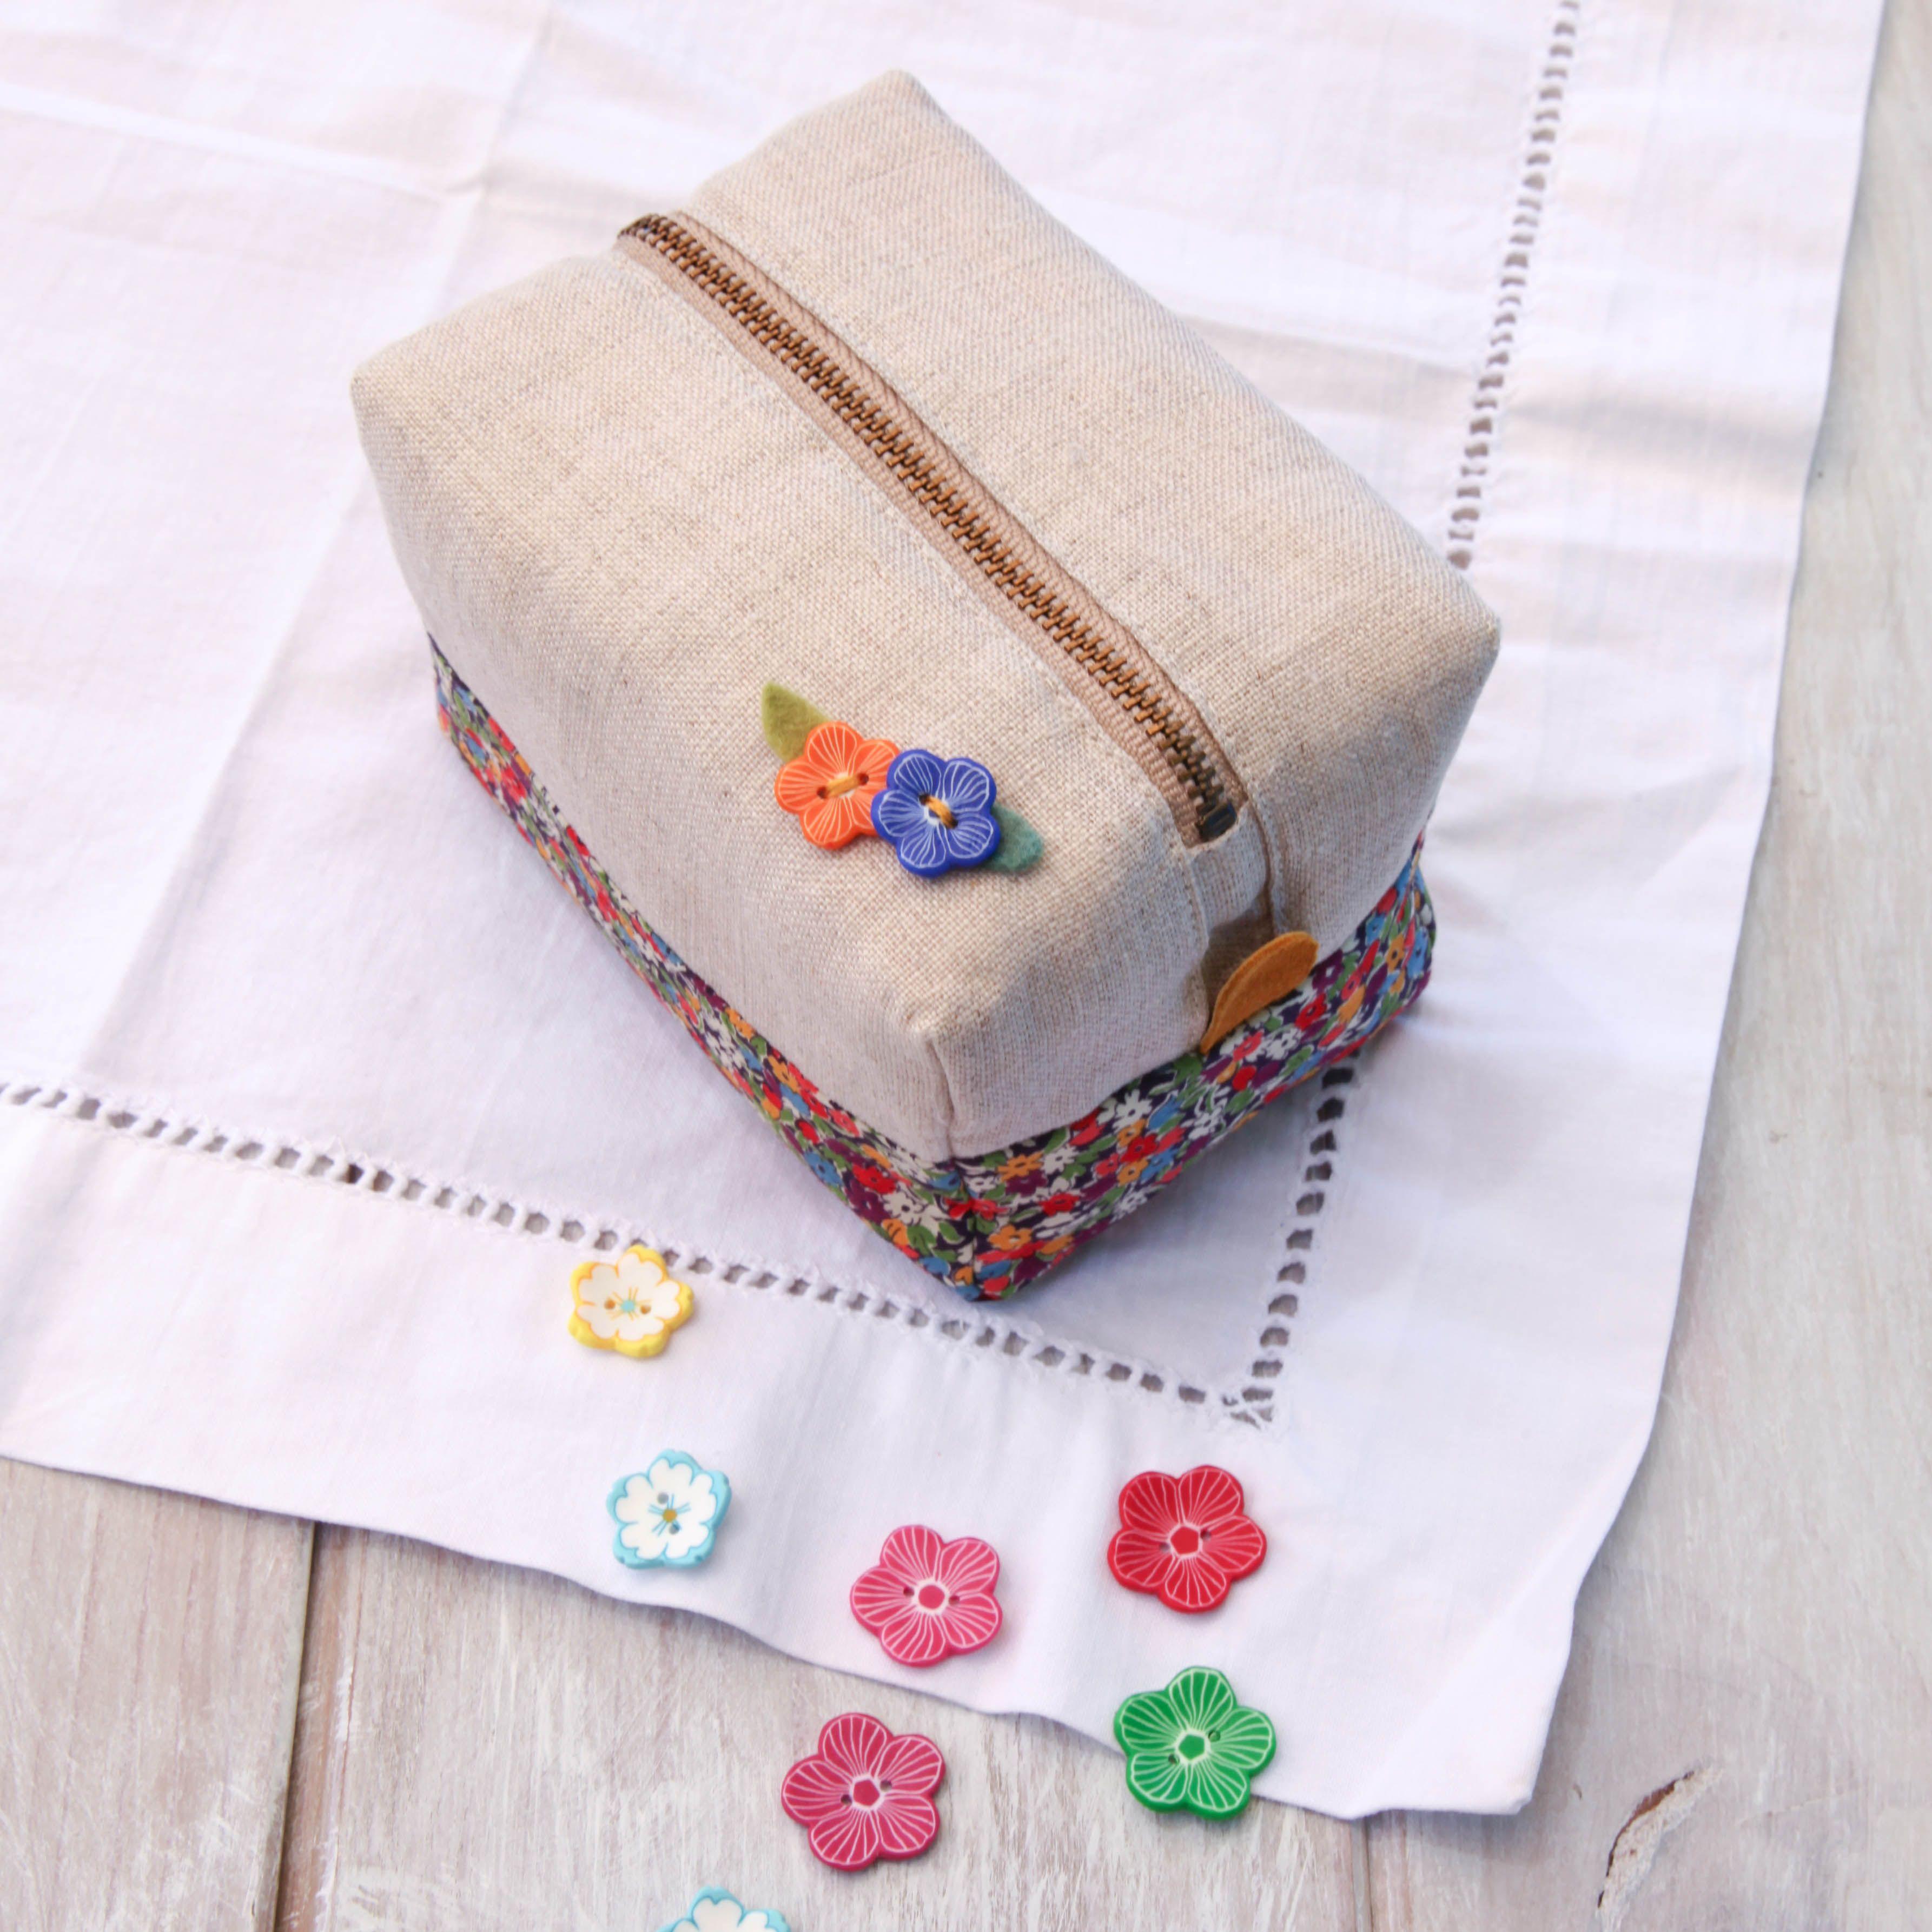 Cute gift idea for anyone, including the fellas. Zipper